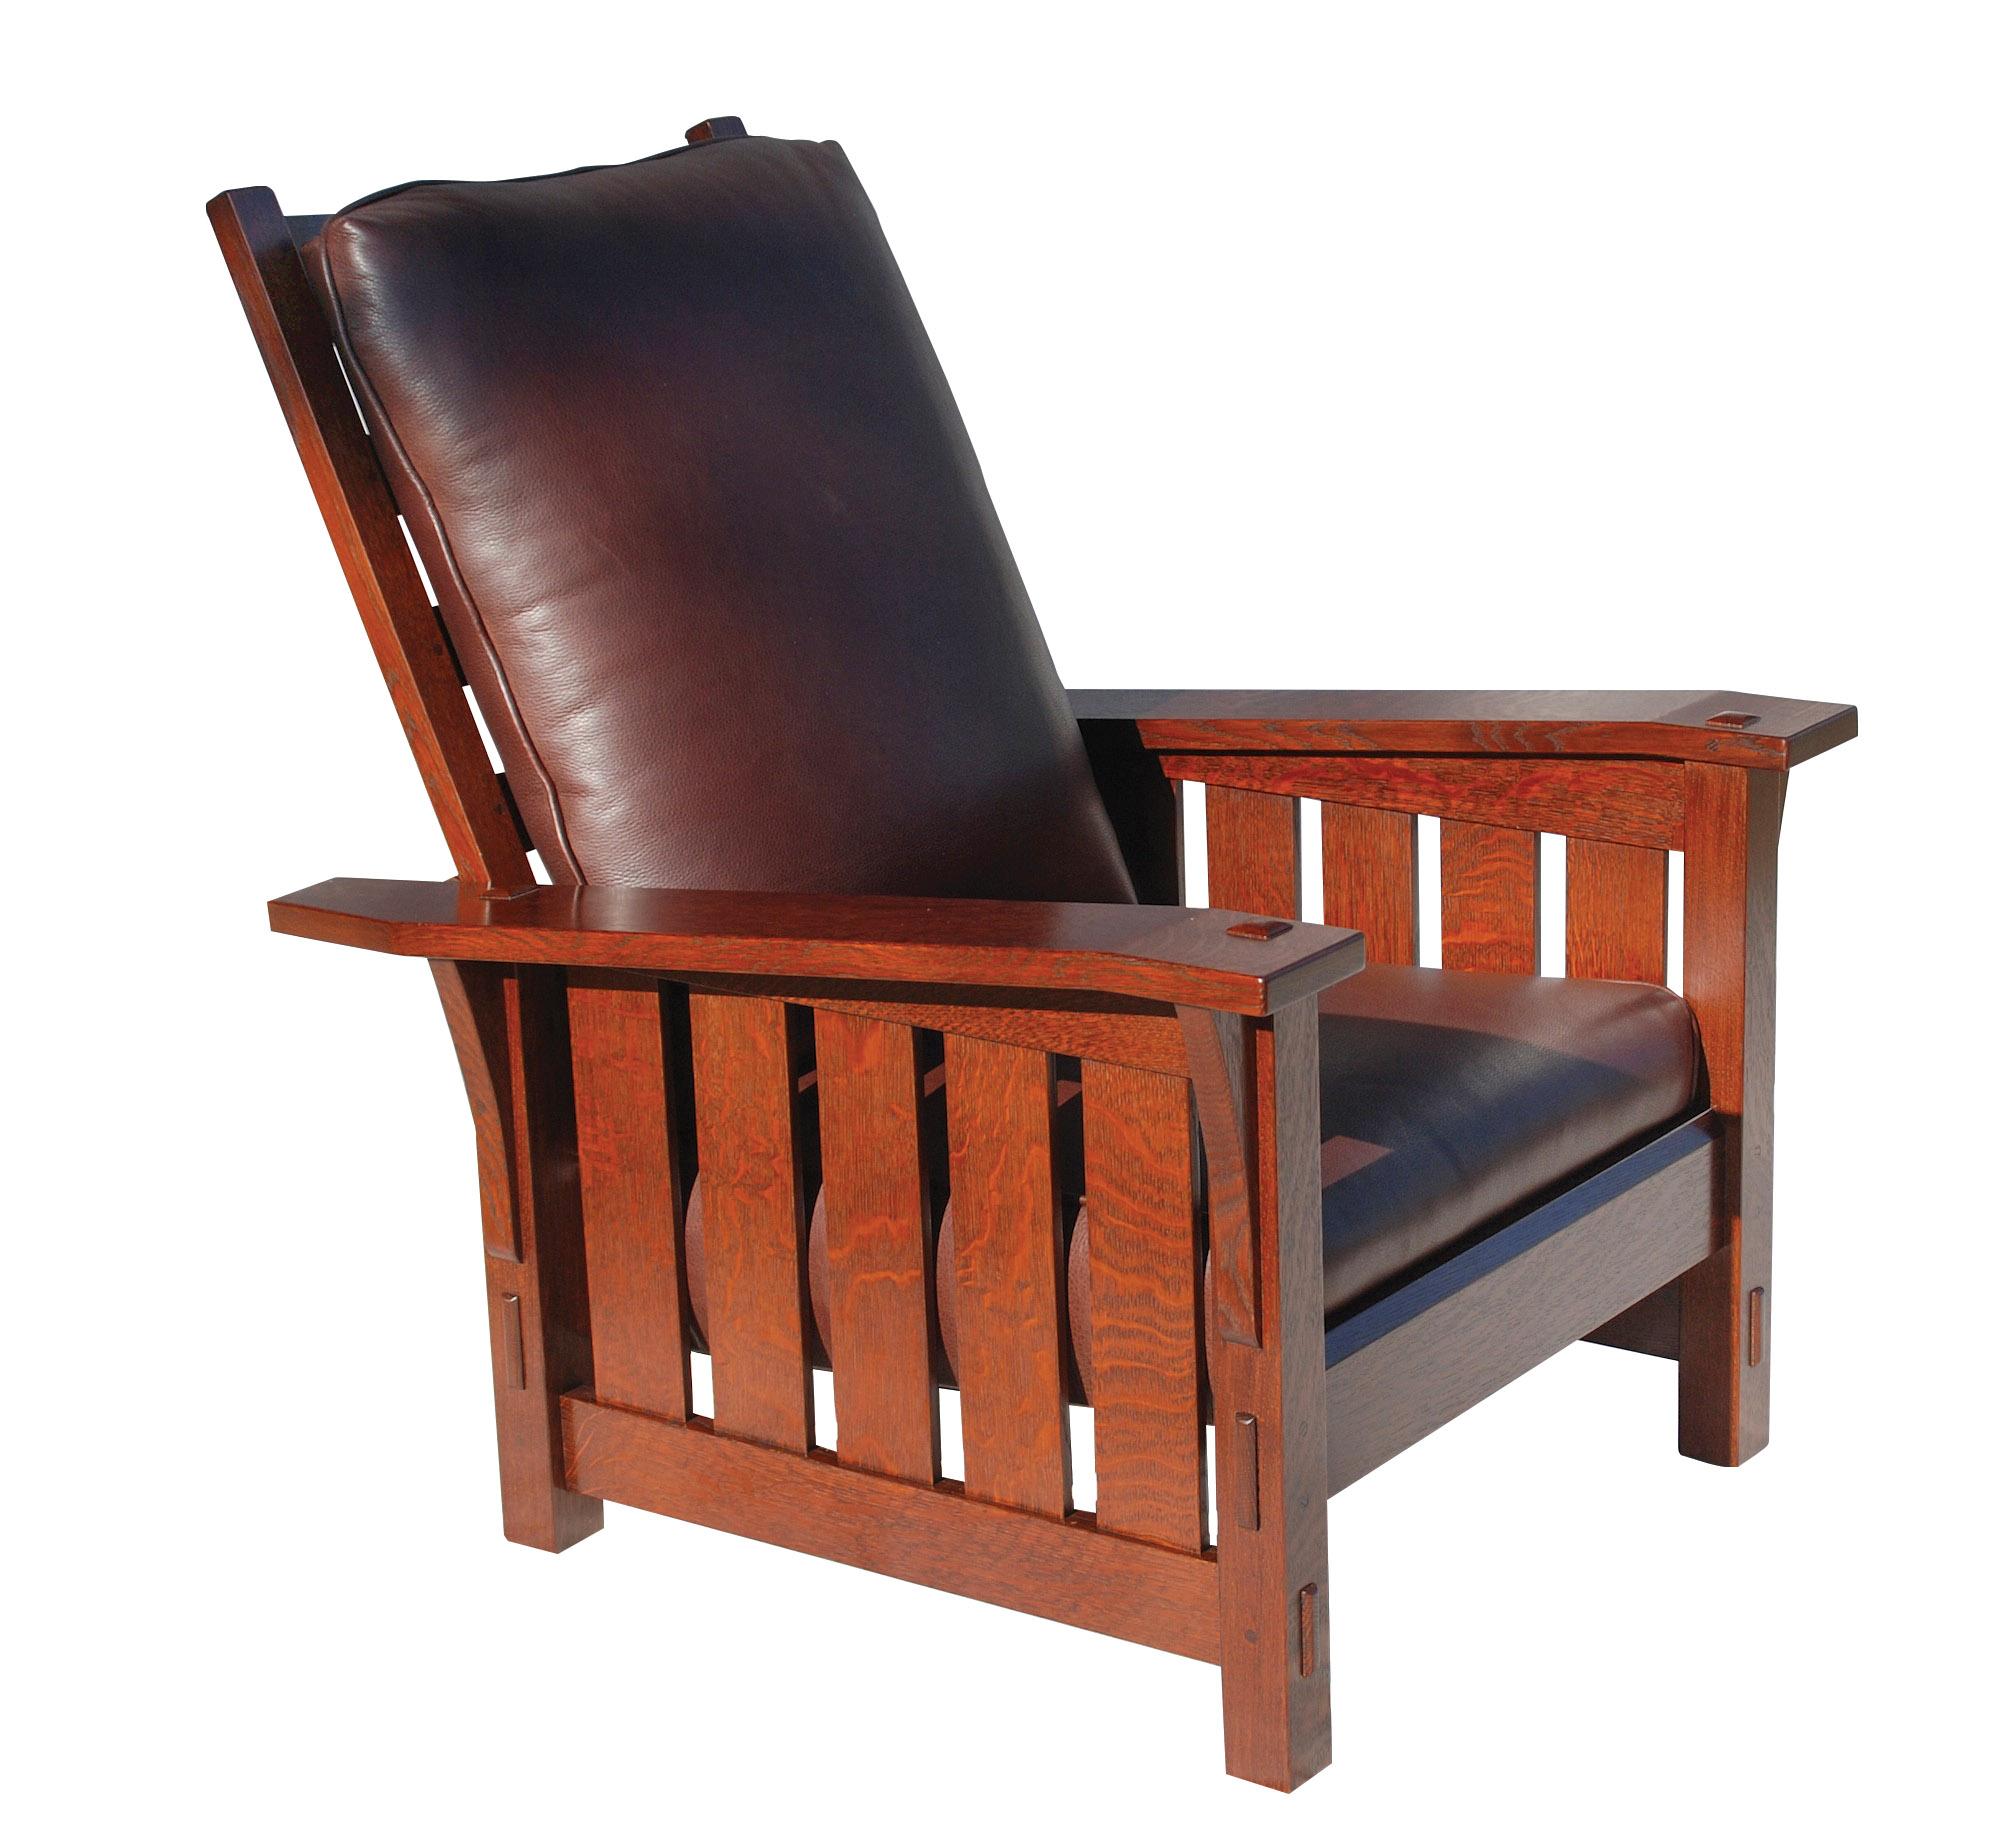 Slant Arm Reclining Morris chair